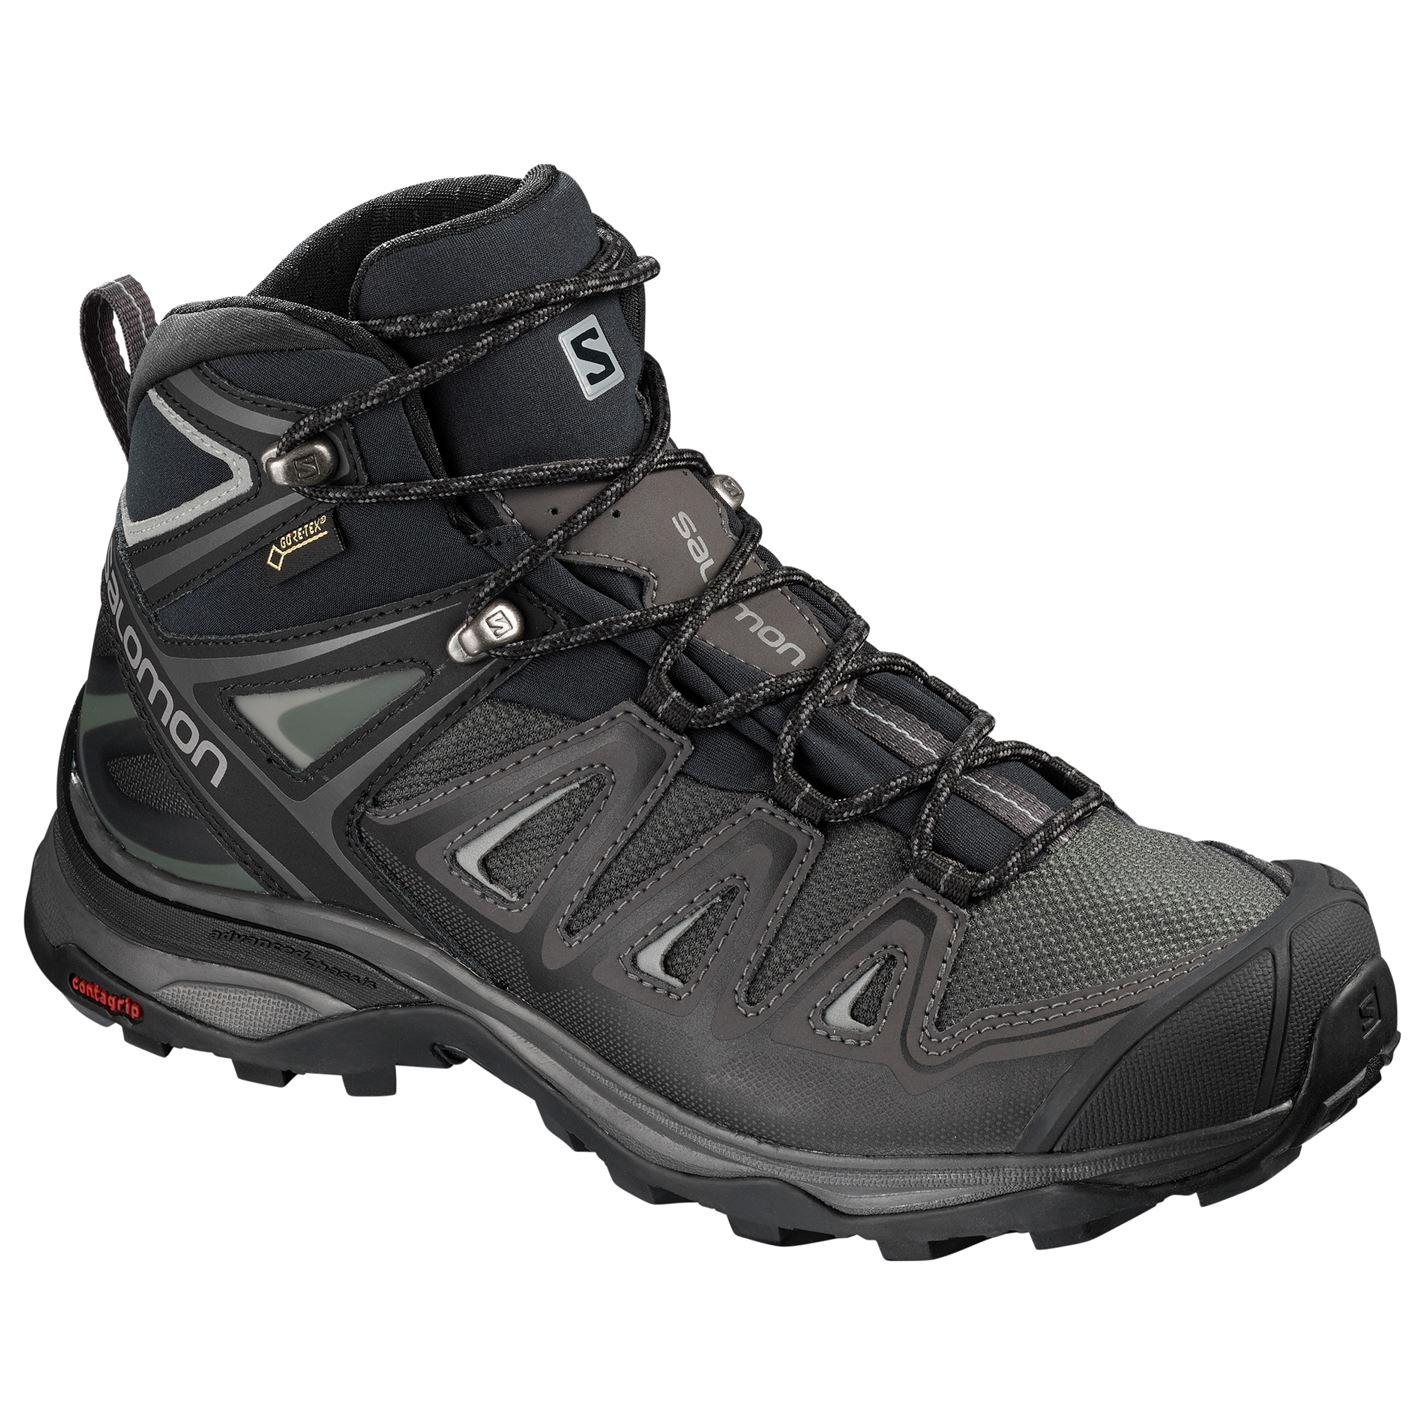 Salomon X Ultra 3 Mid GTX Ladies Walking Shoes